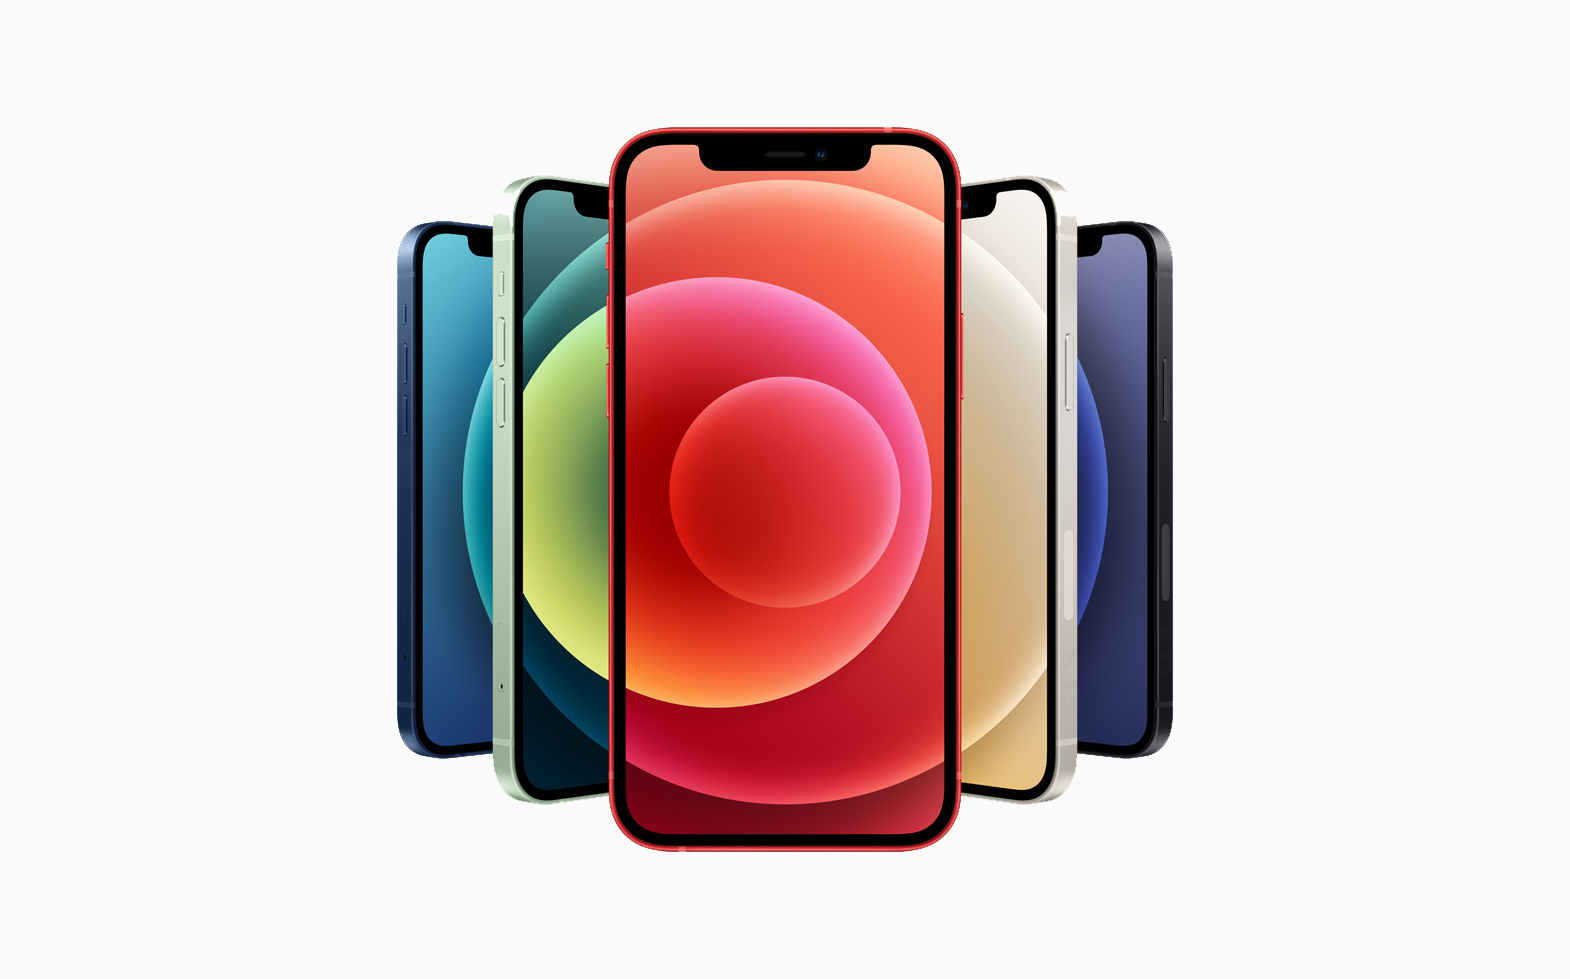 apple_iphone-12_new-design_10132020_big.jpg.large.jpg